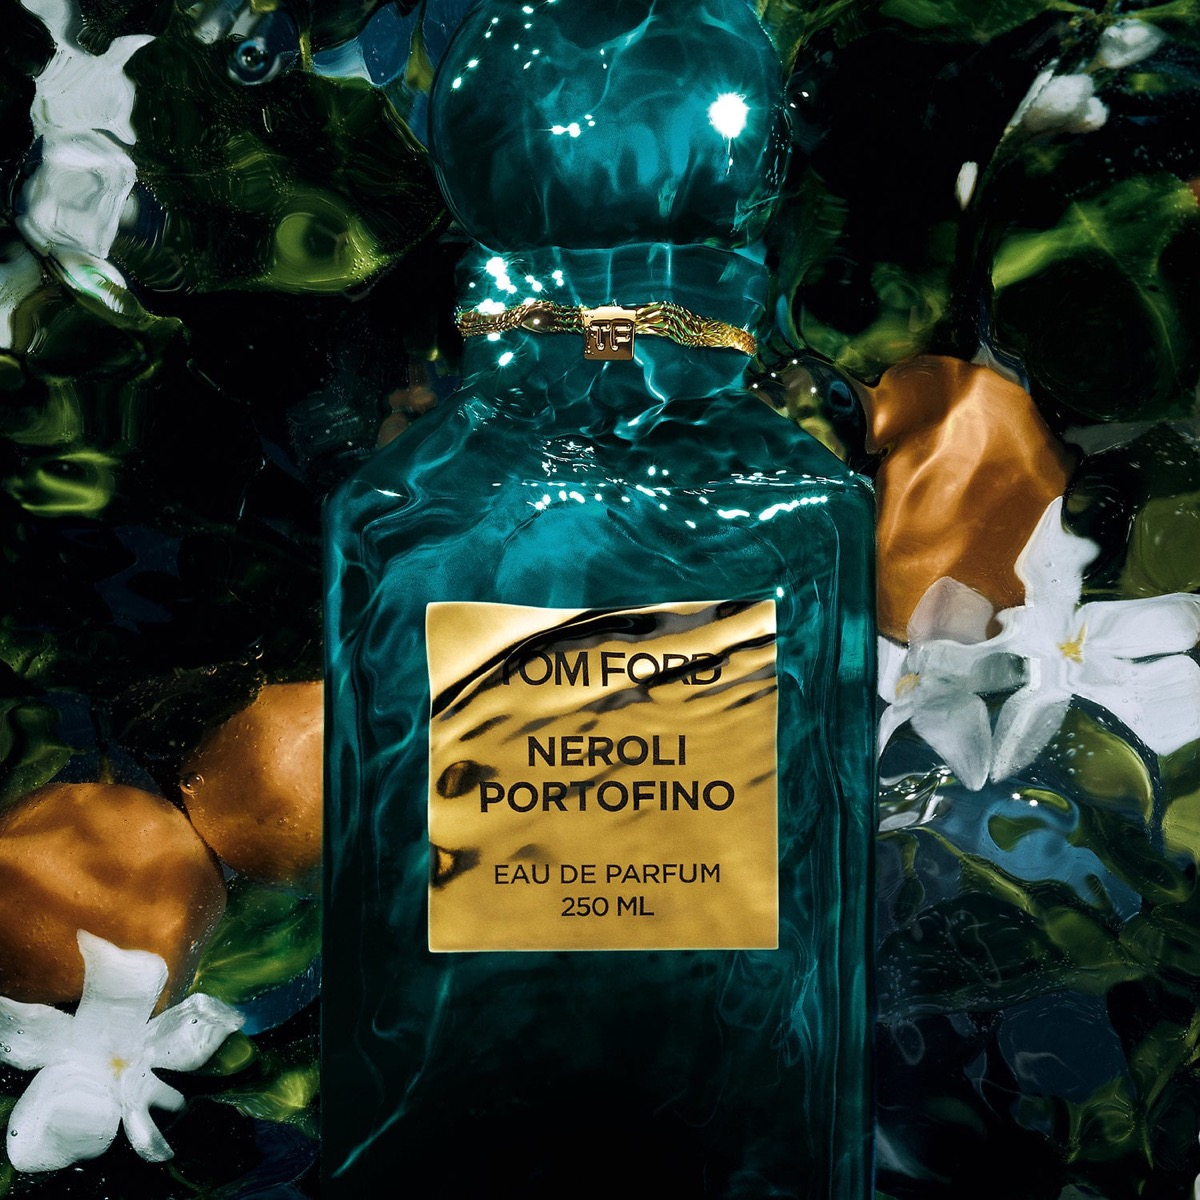 tom ford neroli portofino spray, summer beauty products